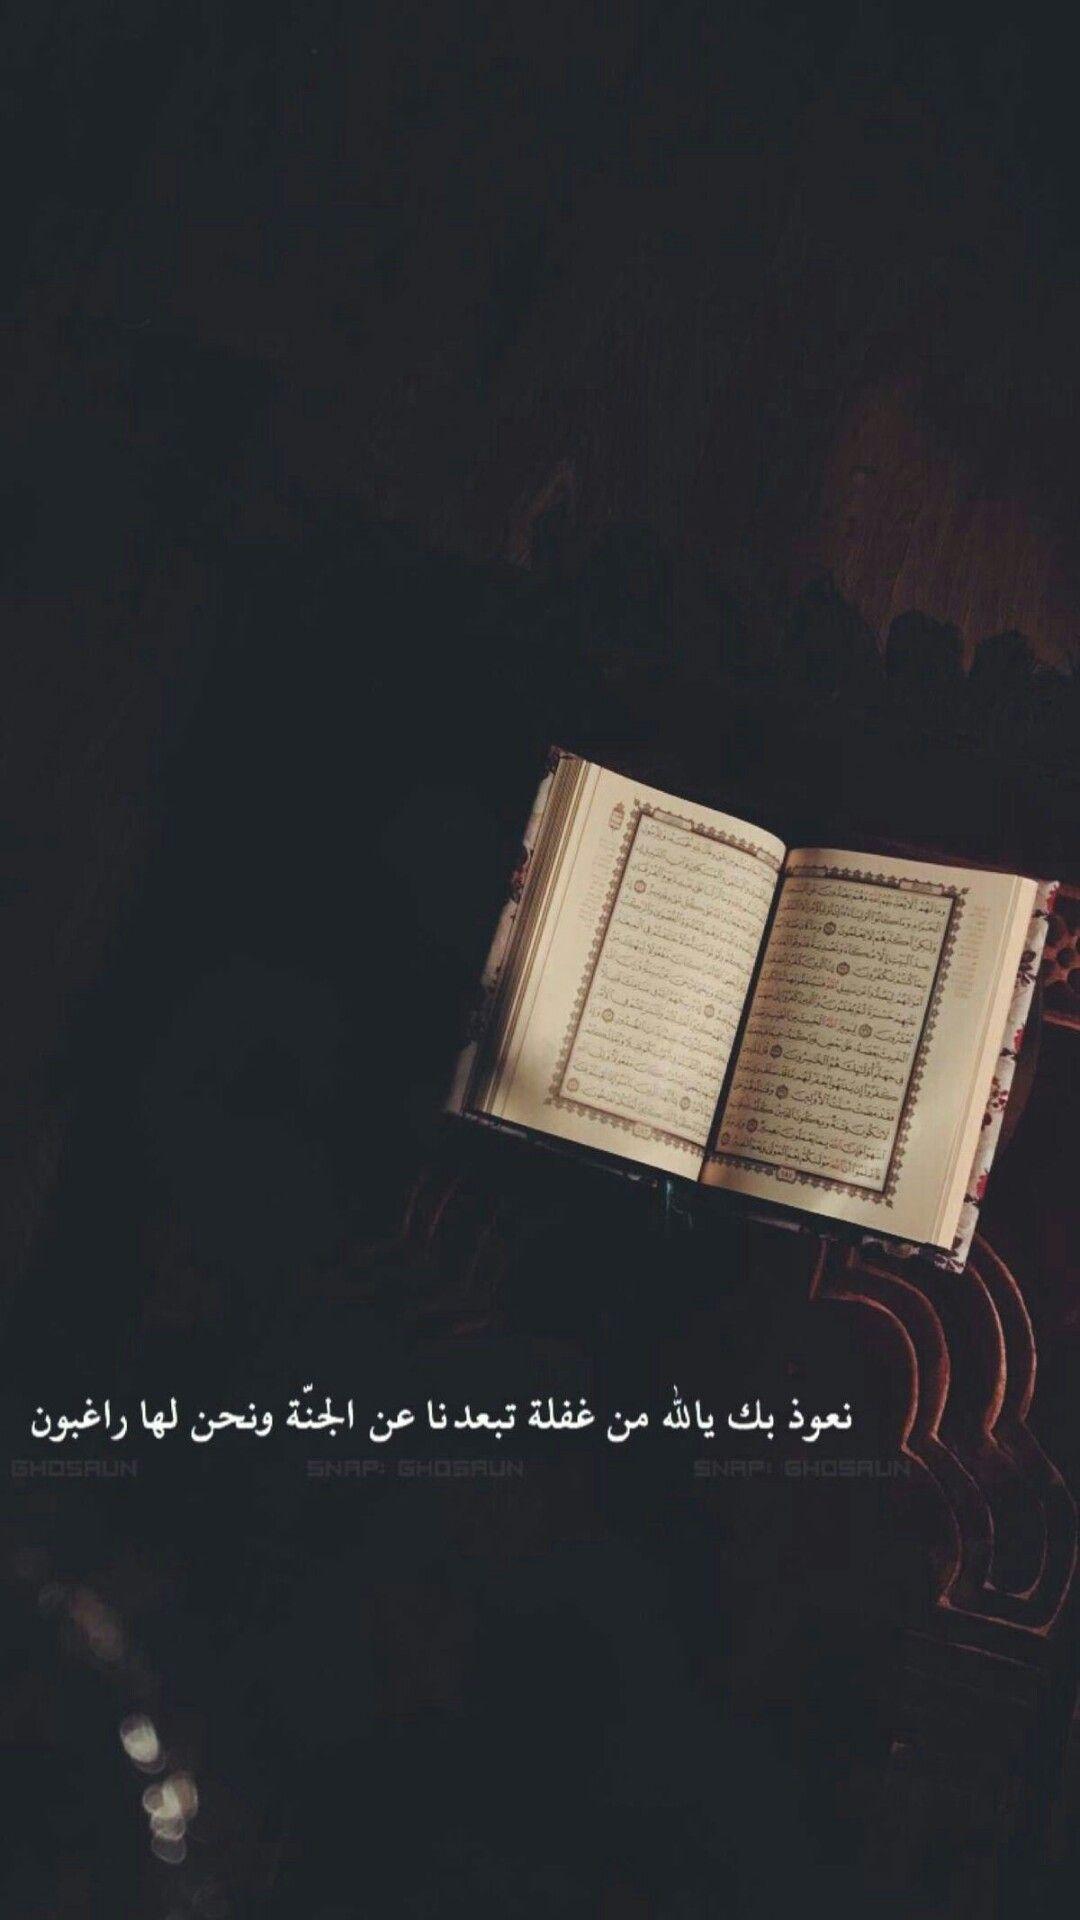 Pin By Saraosni On Young Muslima Beautiful Quran Quotes Quran Book Quran Quotes